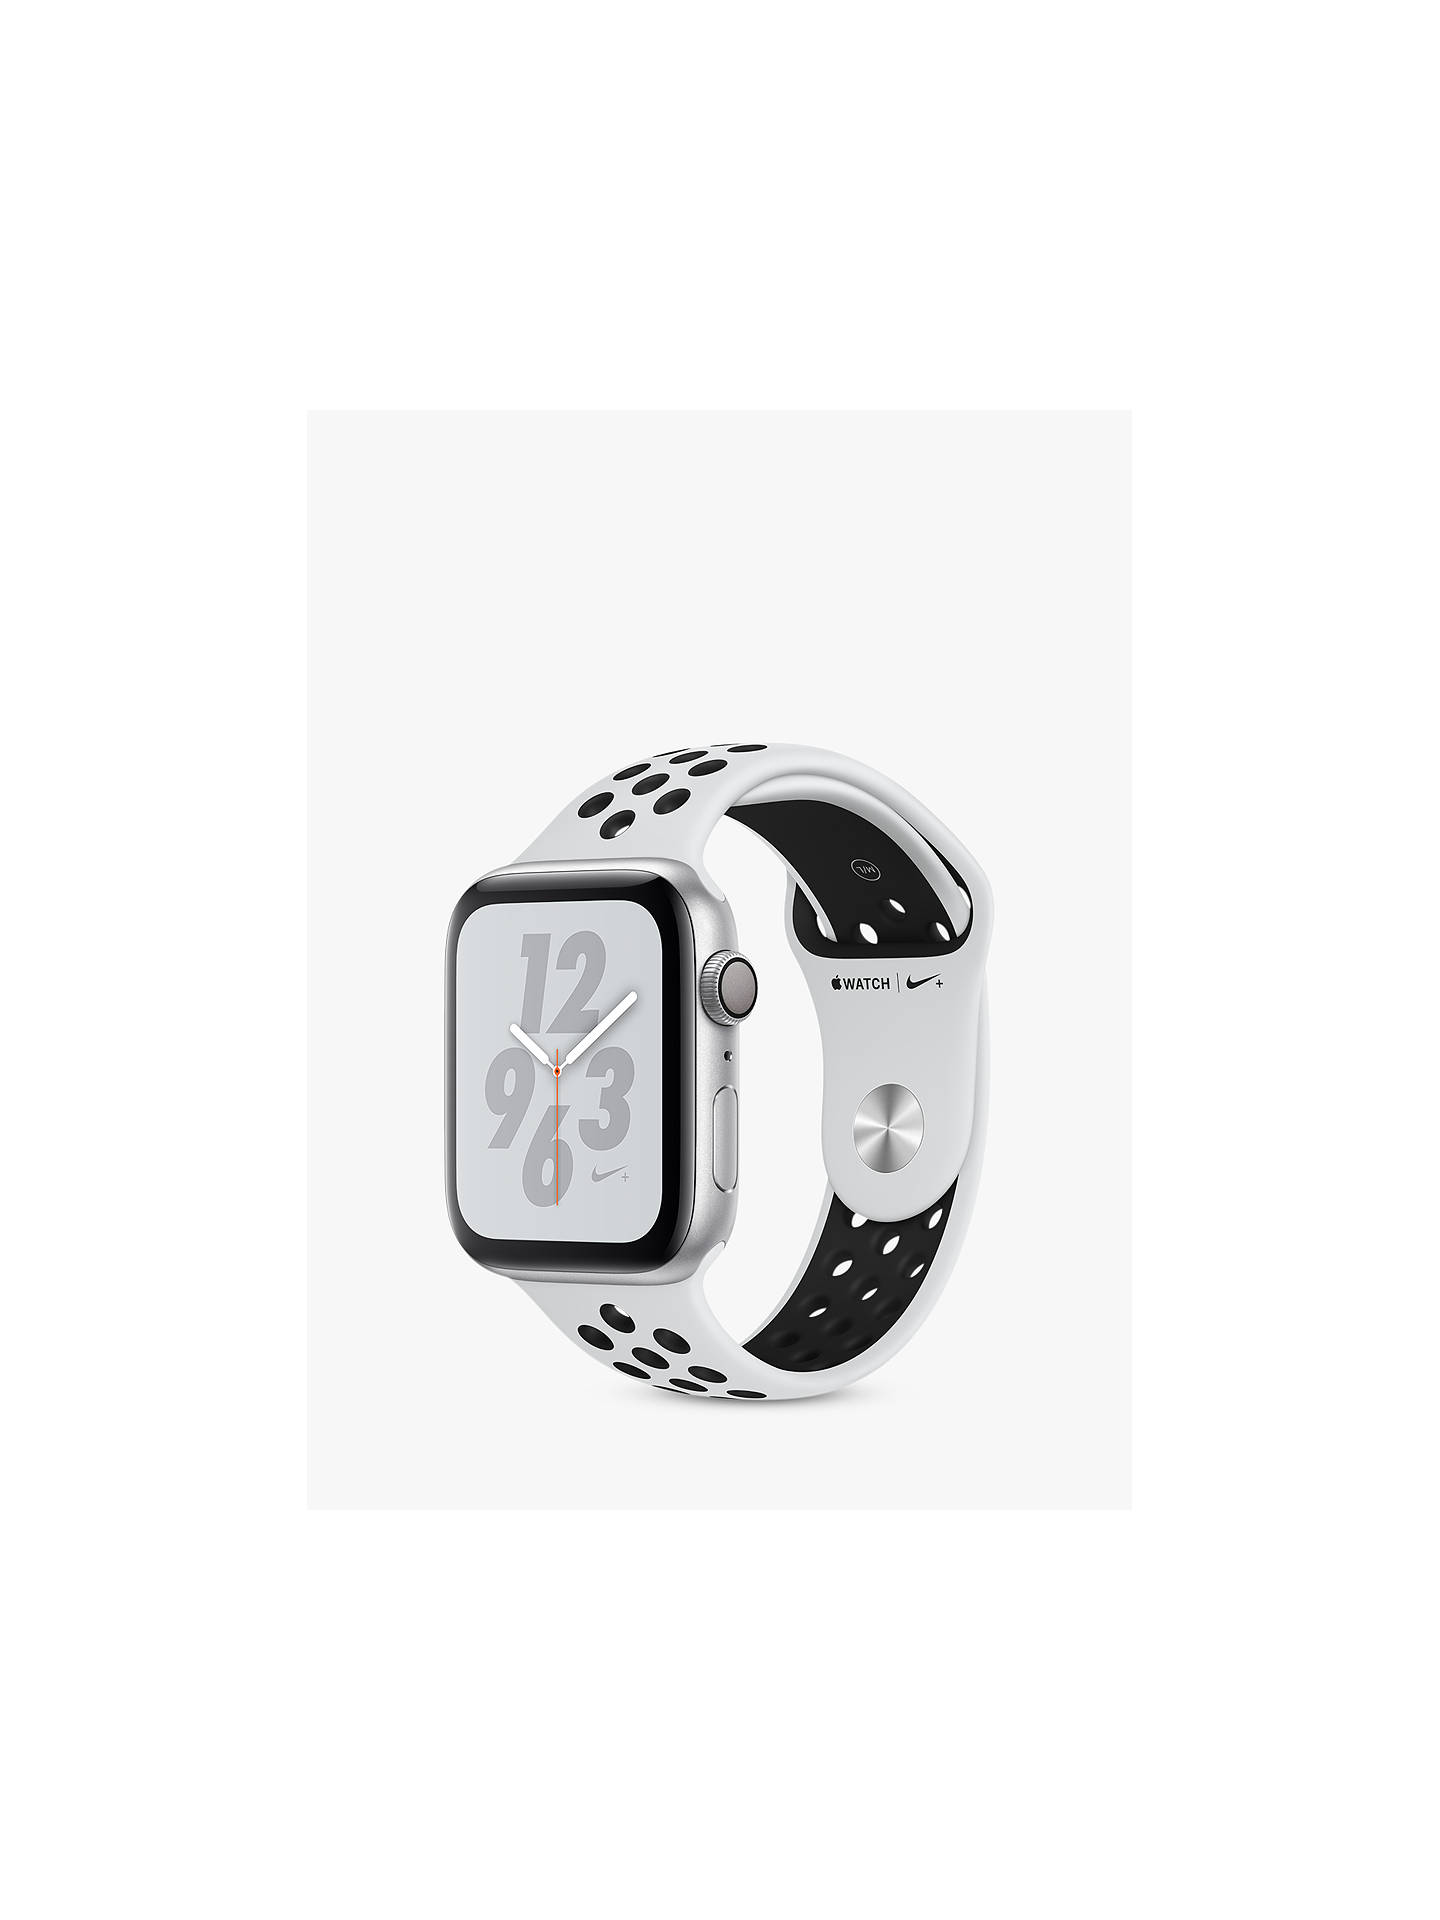 ac80081d5 Apple Watch Series 4